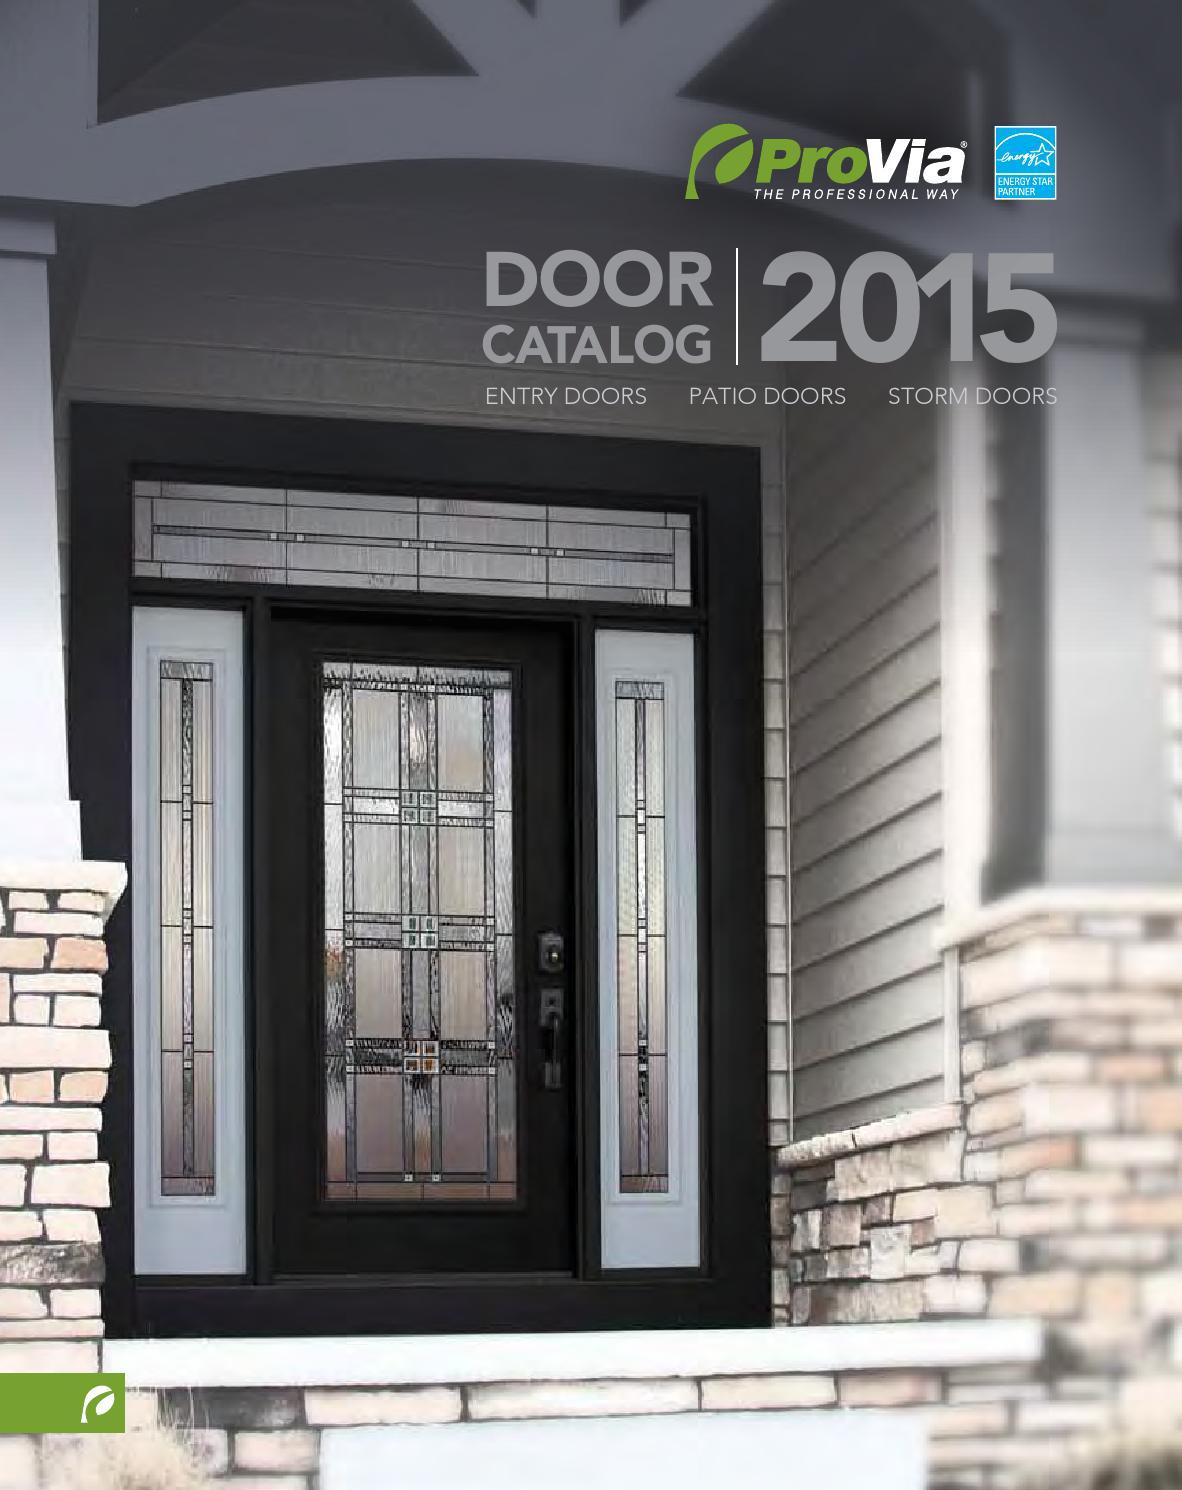 provia door catalog 2015 by minnesota s